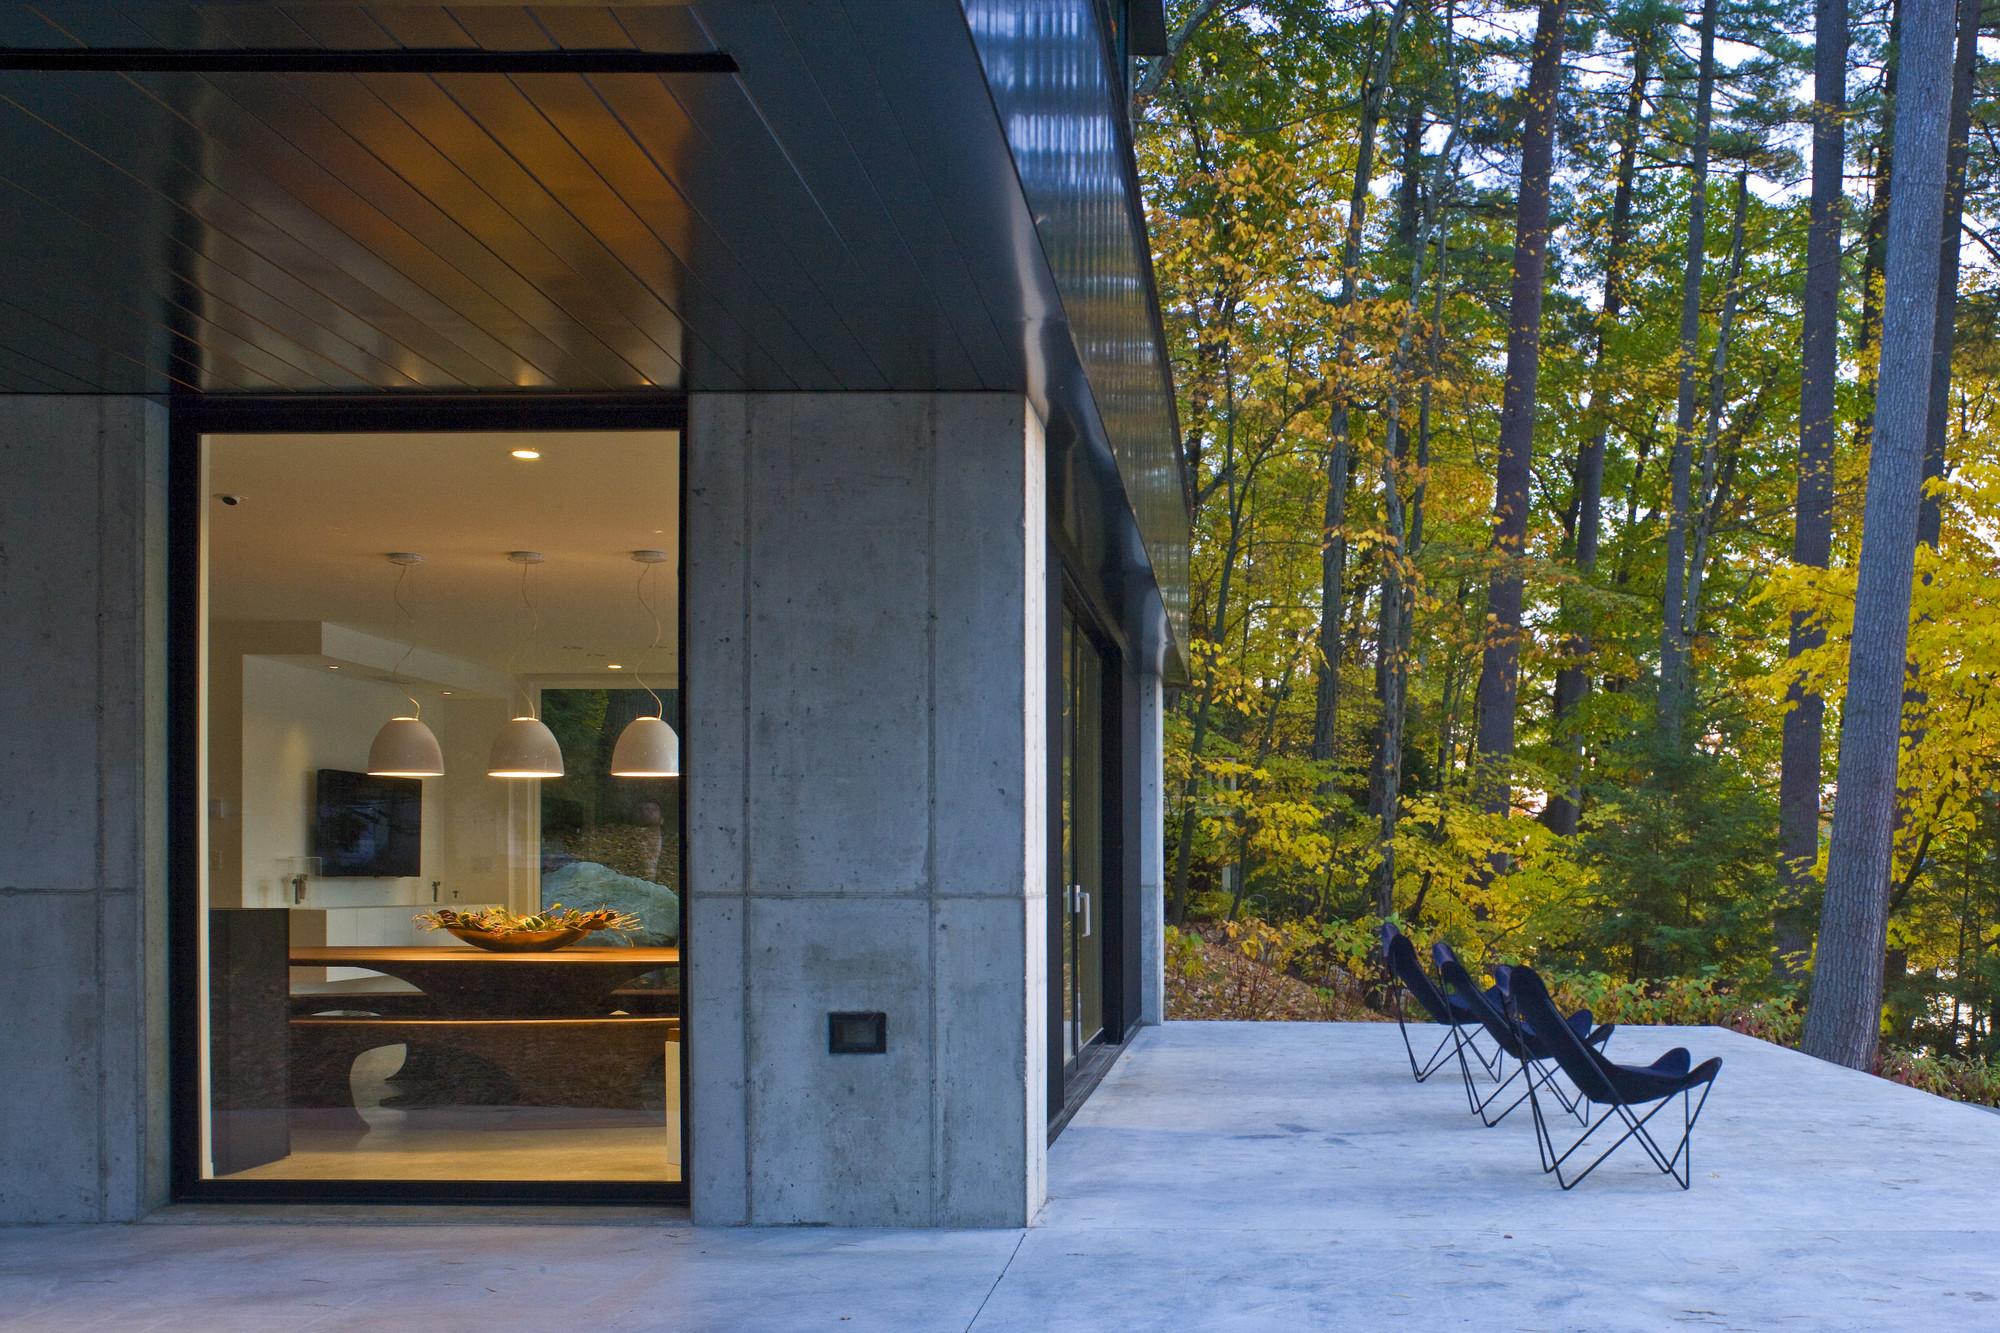 Fantastic Gallery of Cantilever Lake House / Birdseye Design - 4 XJ57